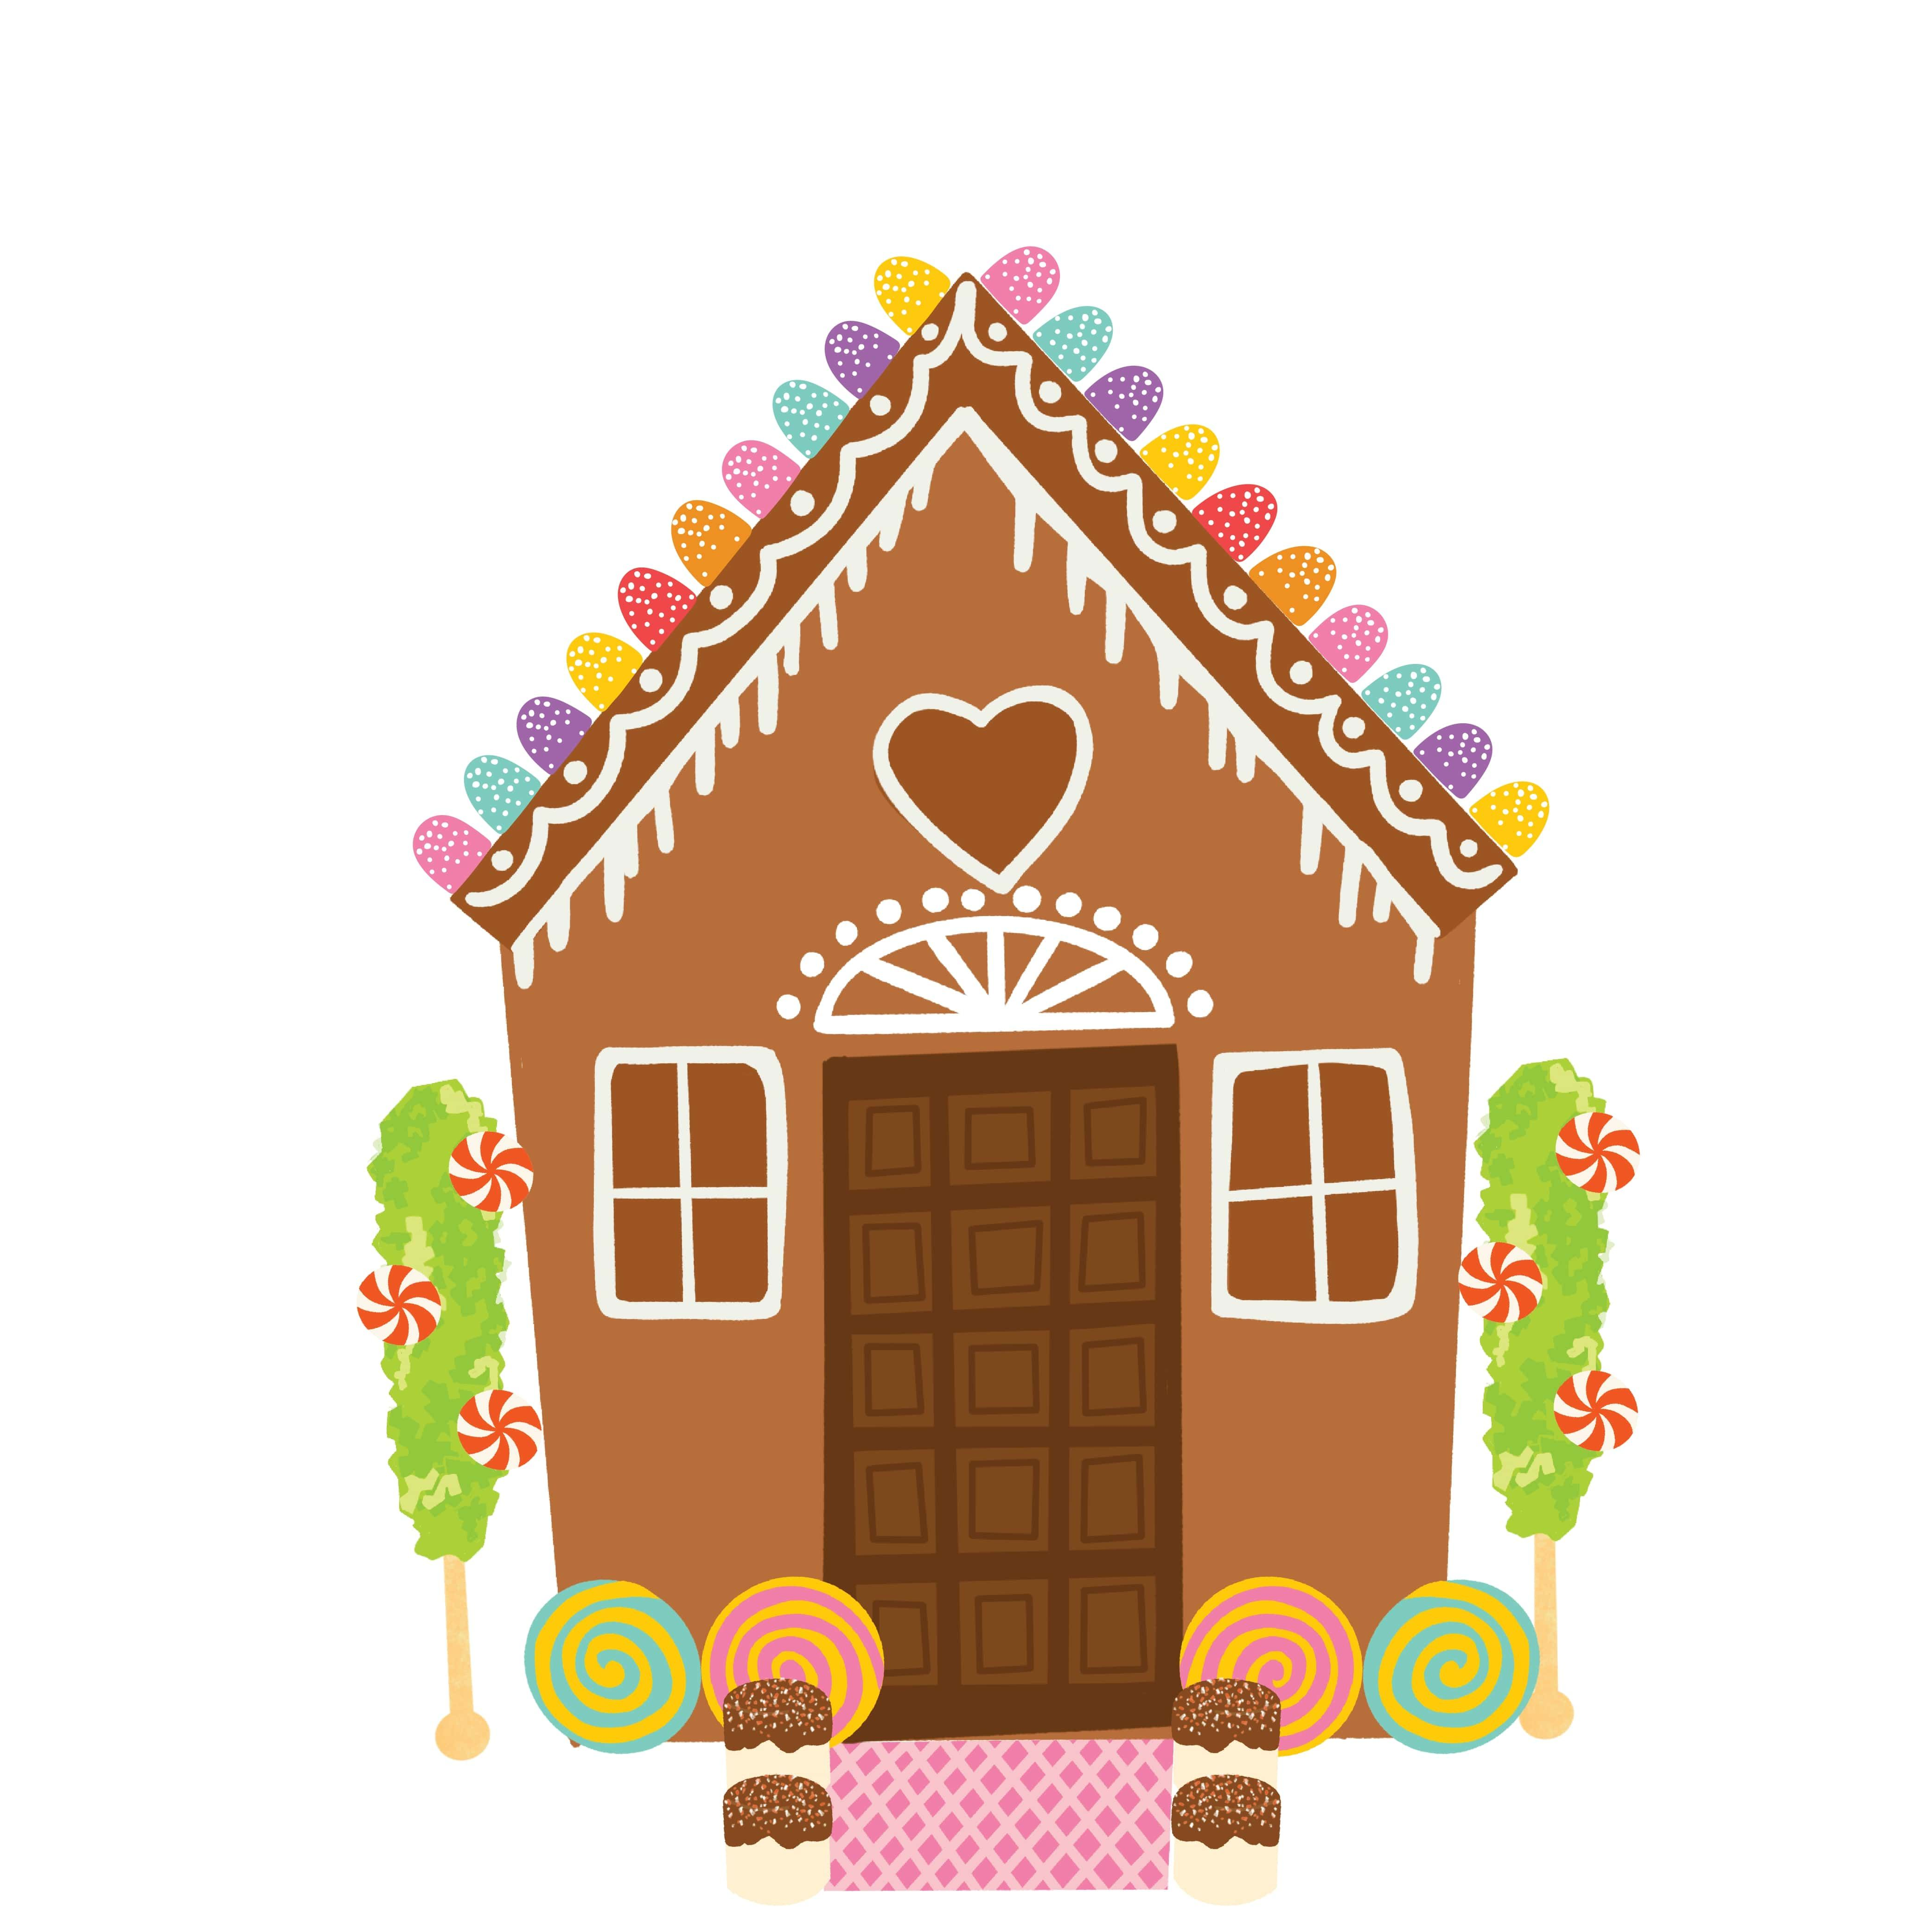 Christmas Gingerbread House Cartoon Png Digital File Etsy Christmas Gingerbread House Cartoons Png Christmas Gingerbread